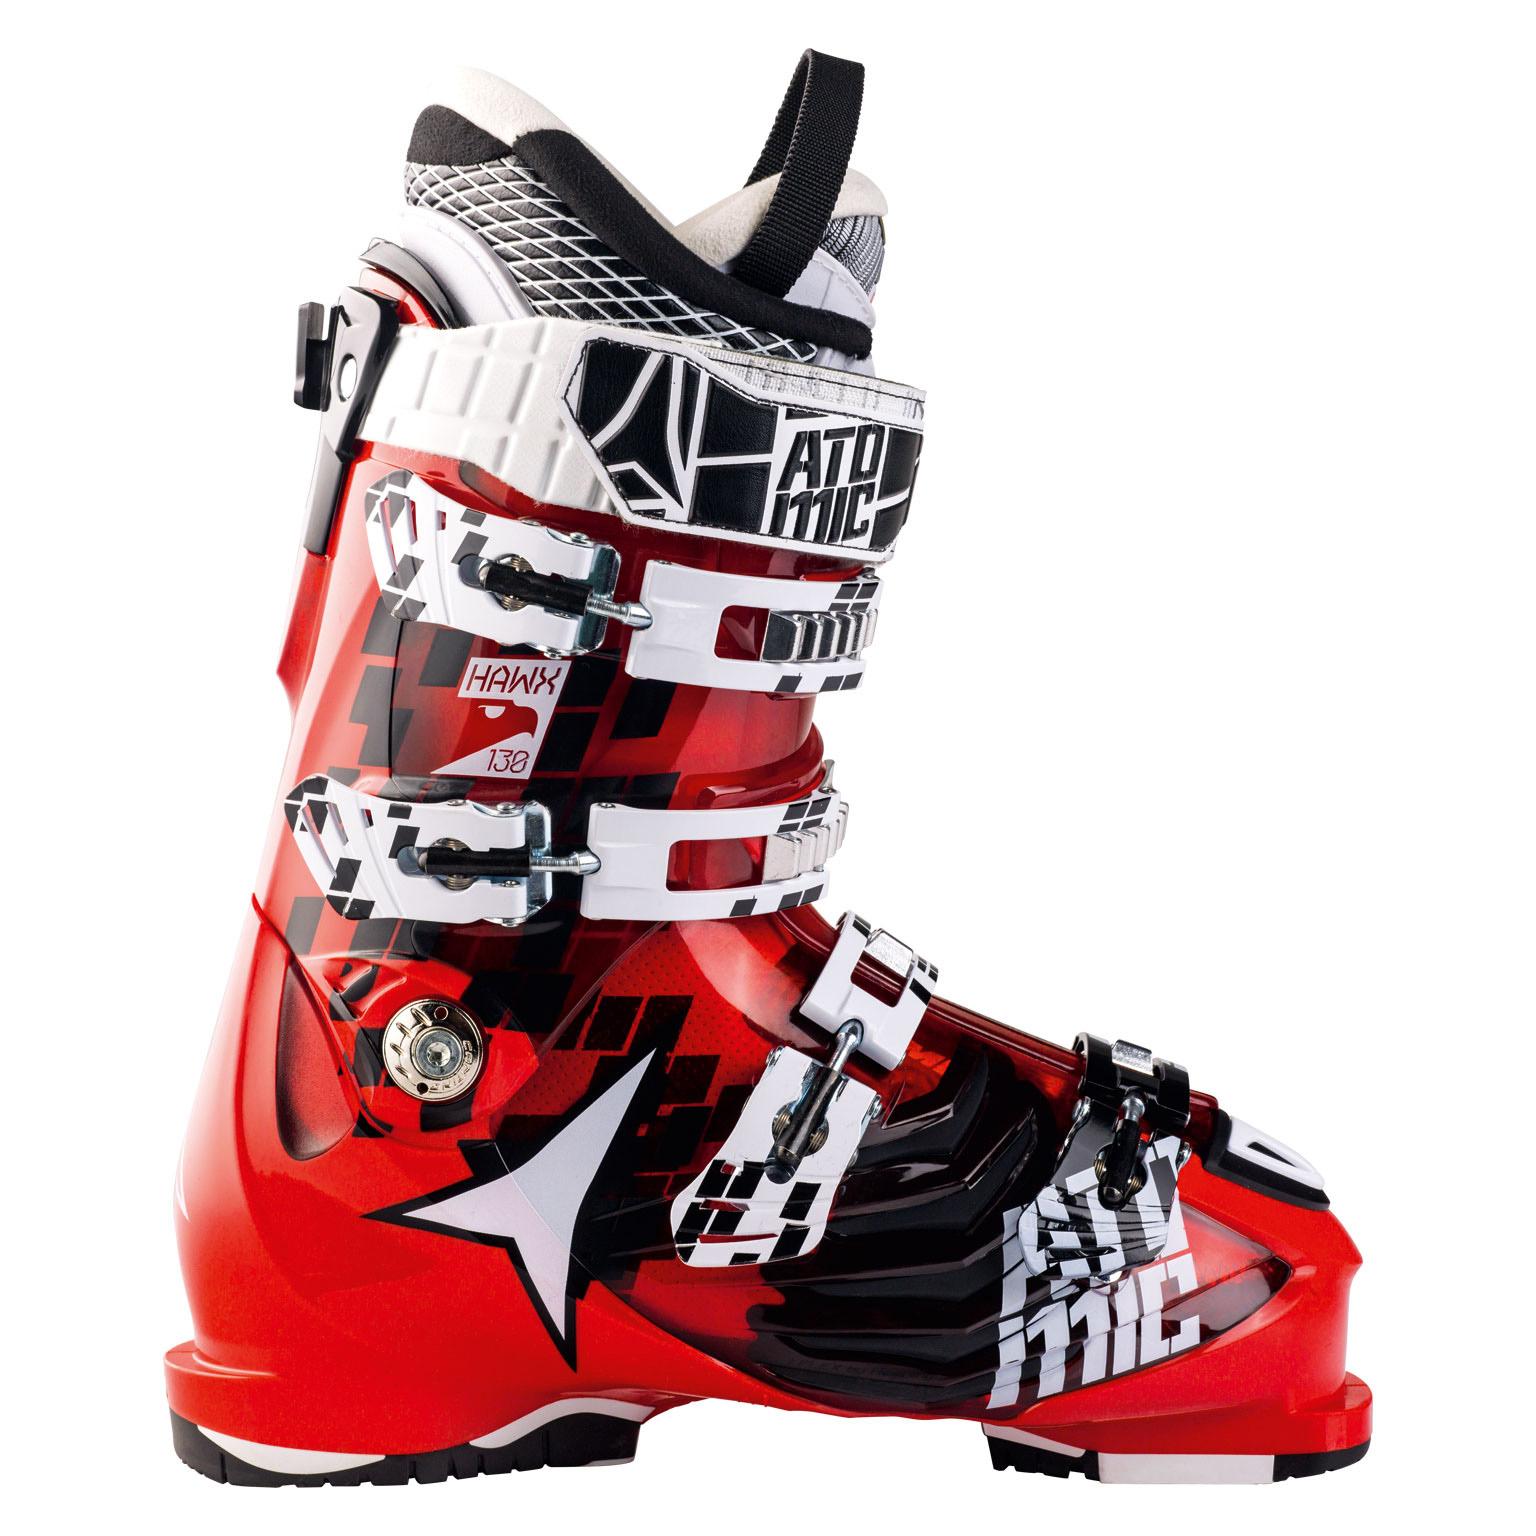 competitive price 21cd0 73092 Ski Boots | Atomic Hawx 130 | Ski